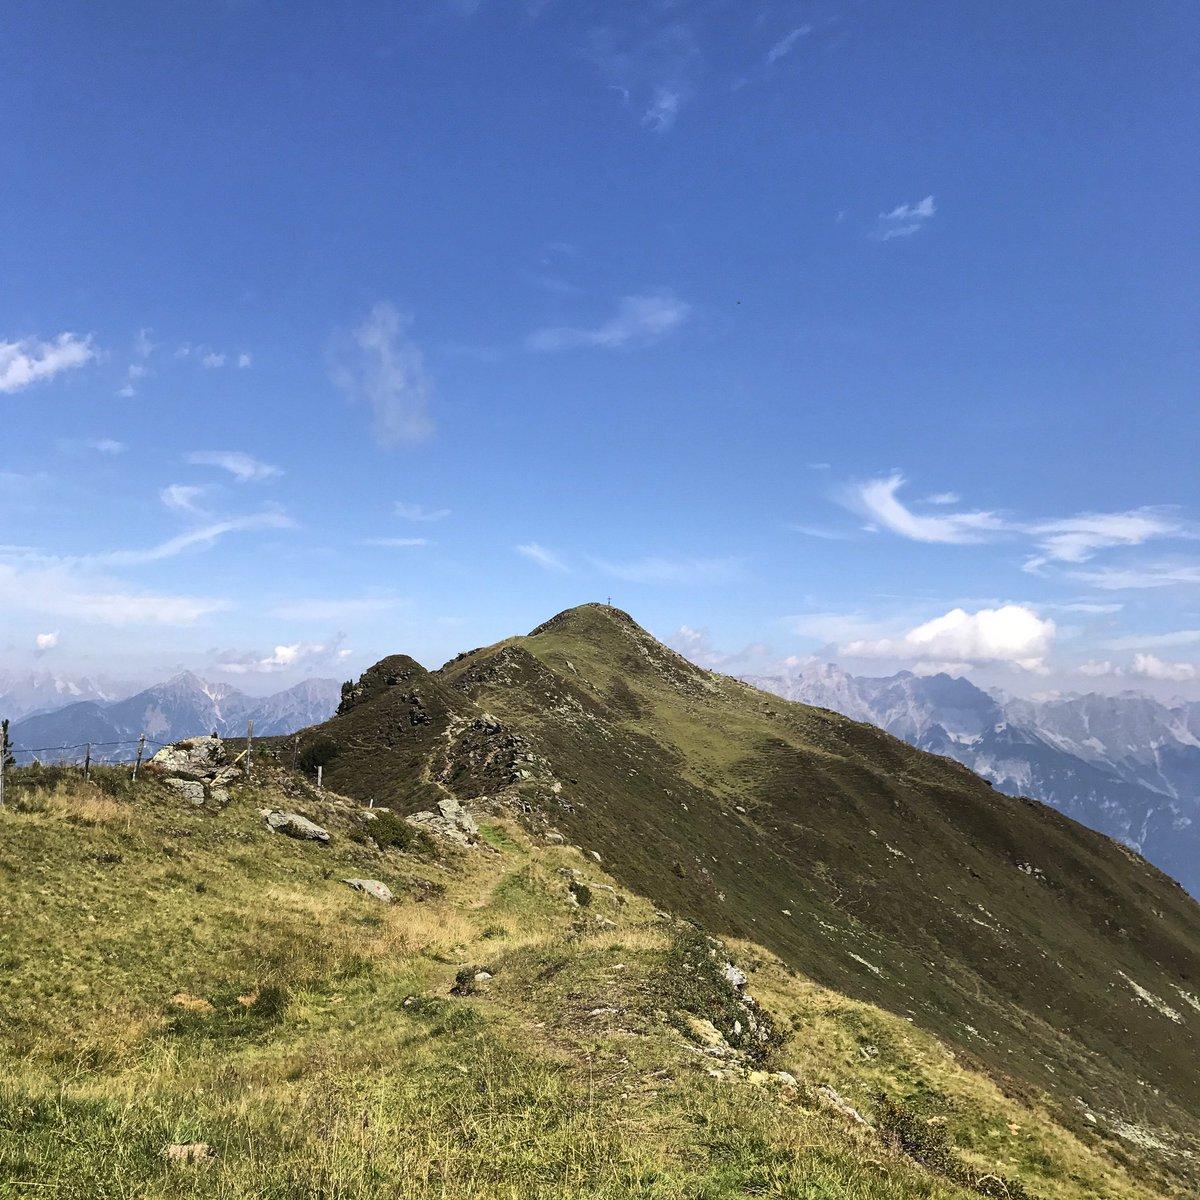 I&#39;m walking on sunshine, woooah #Austria #tirolo #love #holiday #vacances <br>http://pic.twitter.com/bsy5Y1FVou